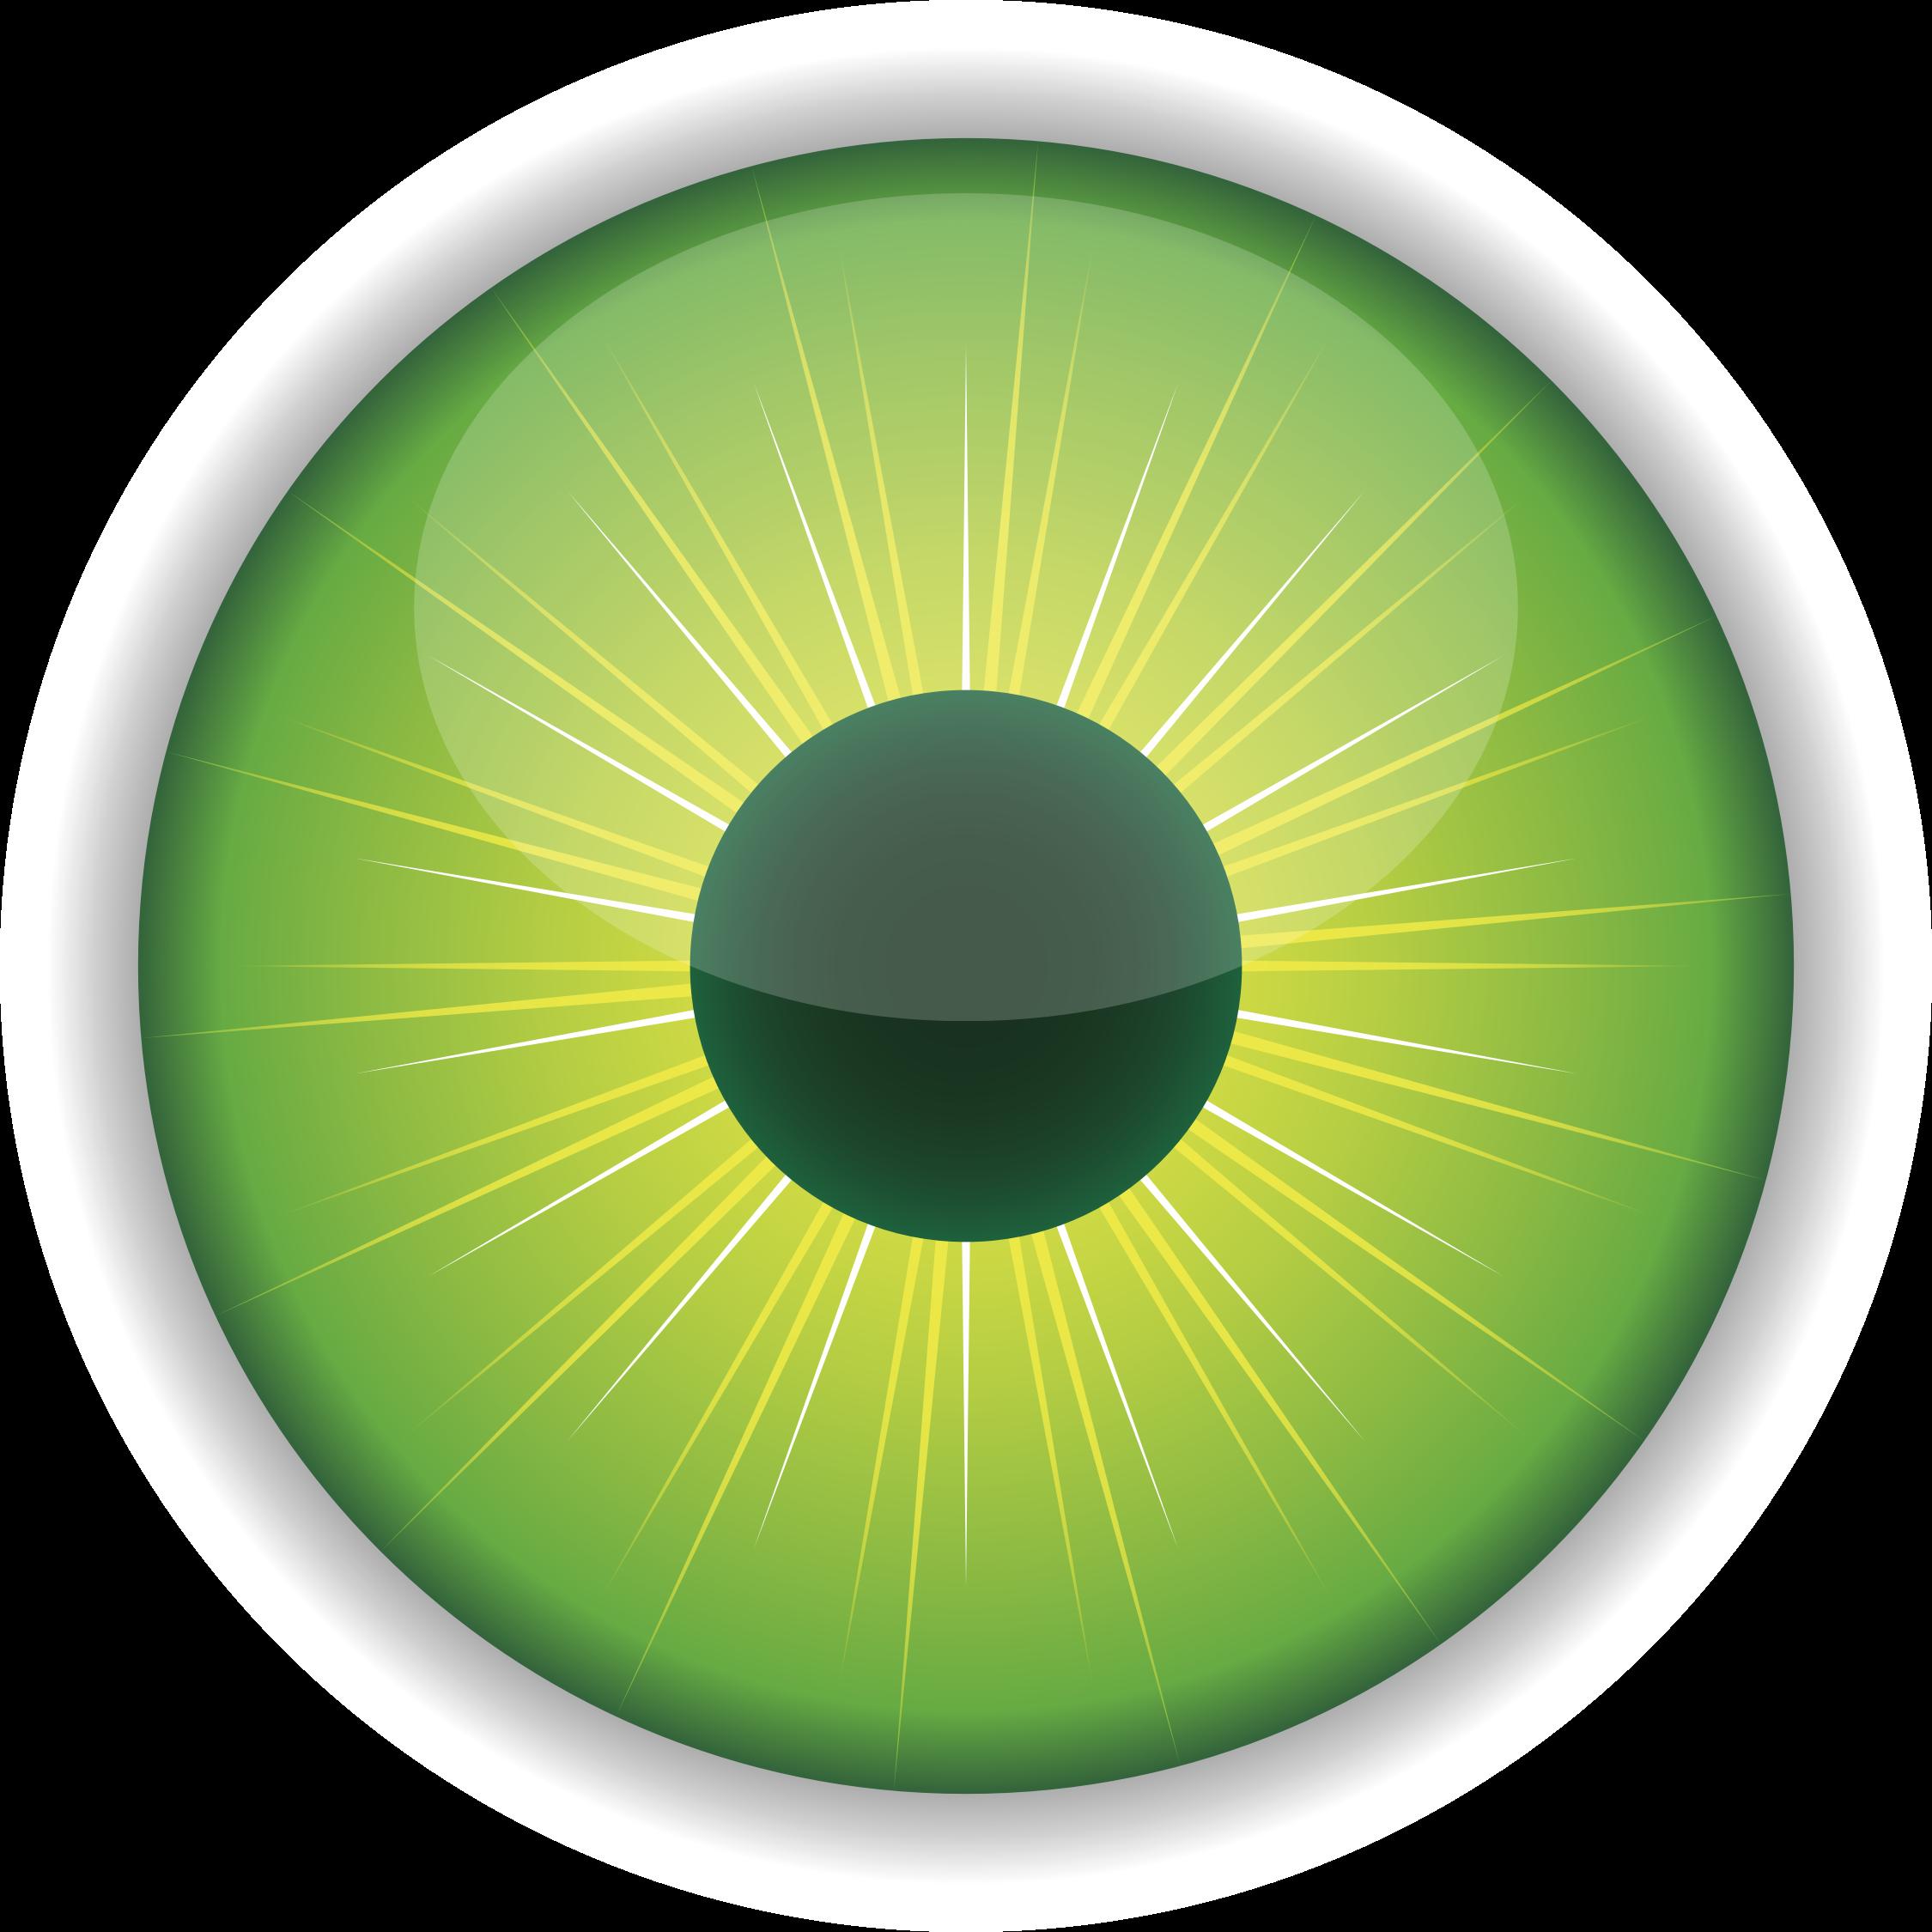 Green eye big image. Eyeball clipart dark eyes